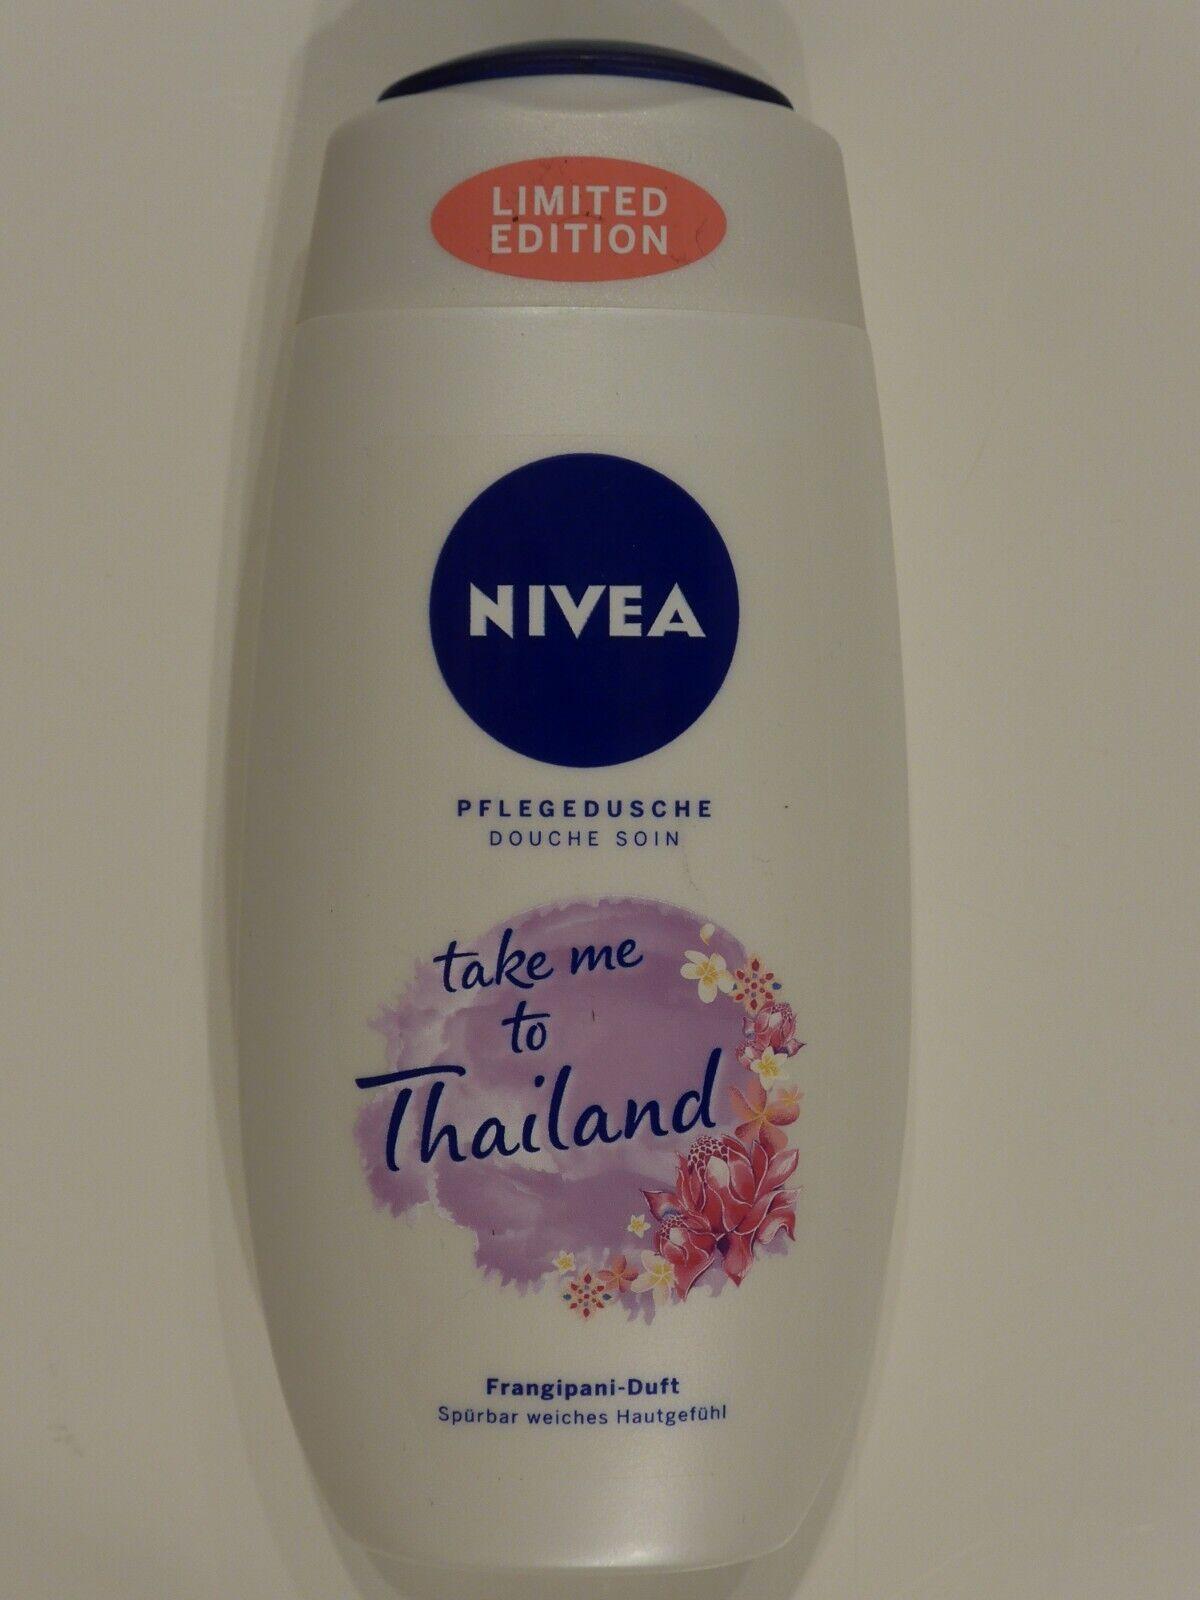 (3,60 € je 100ml) NIVEA - Pflegedusche TAKE ME TO THAILAND Frangipani Duft 250ml